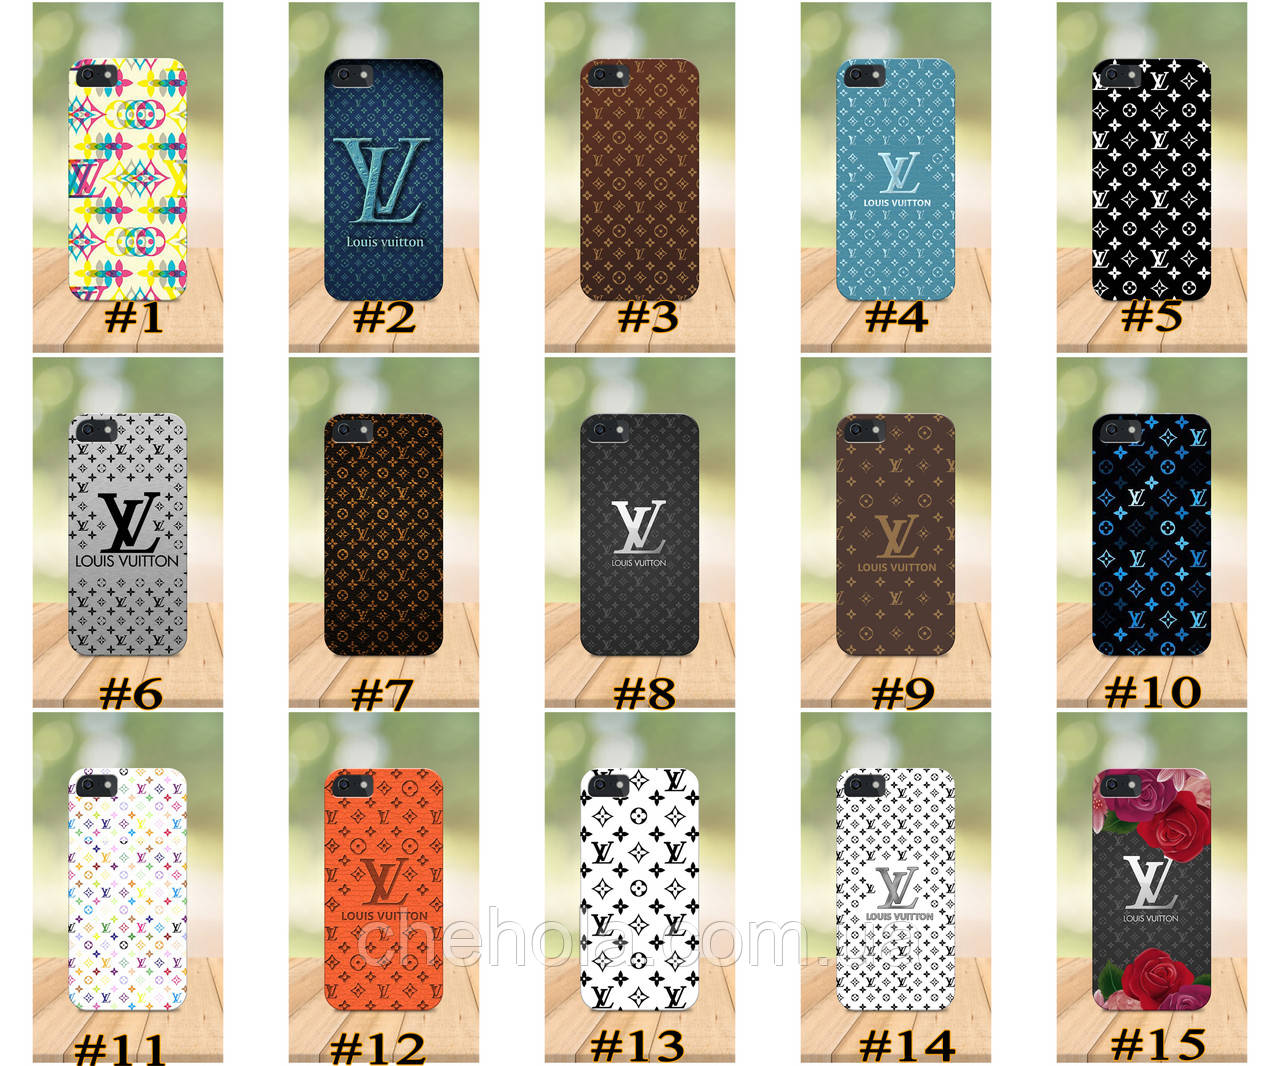 Чохол на iPhone 5 5s SE 4 4S бампер накладка з принтом в стилі LV Louis Vuitton